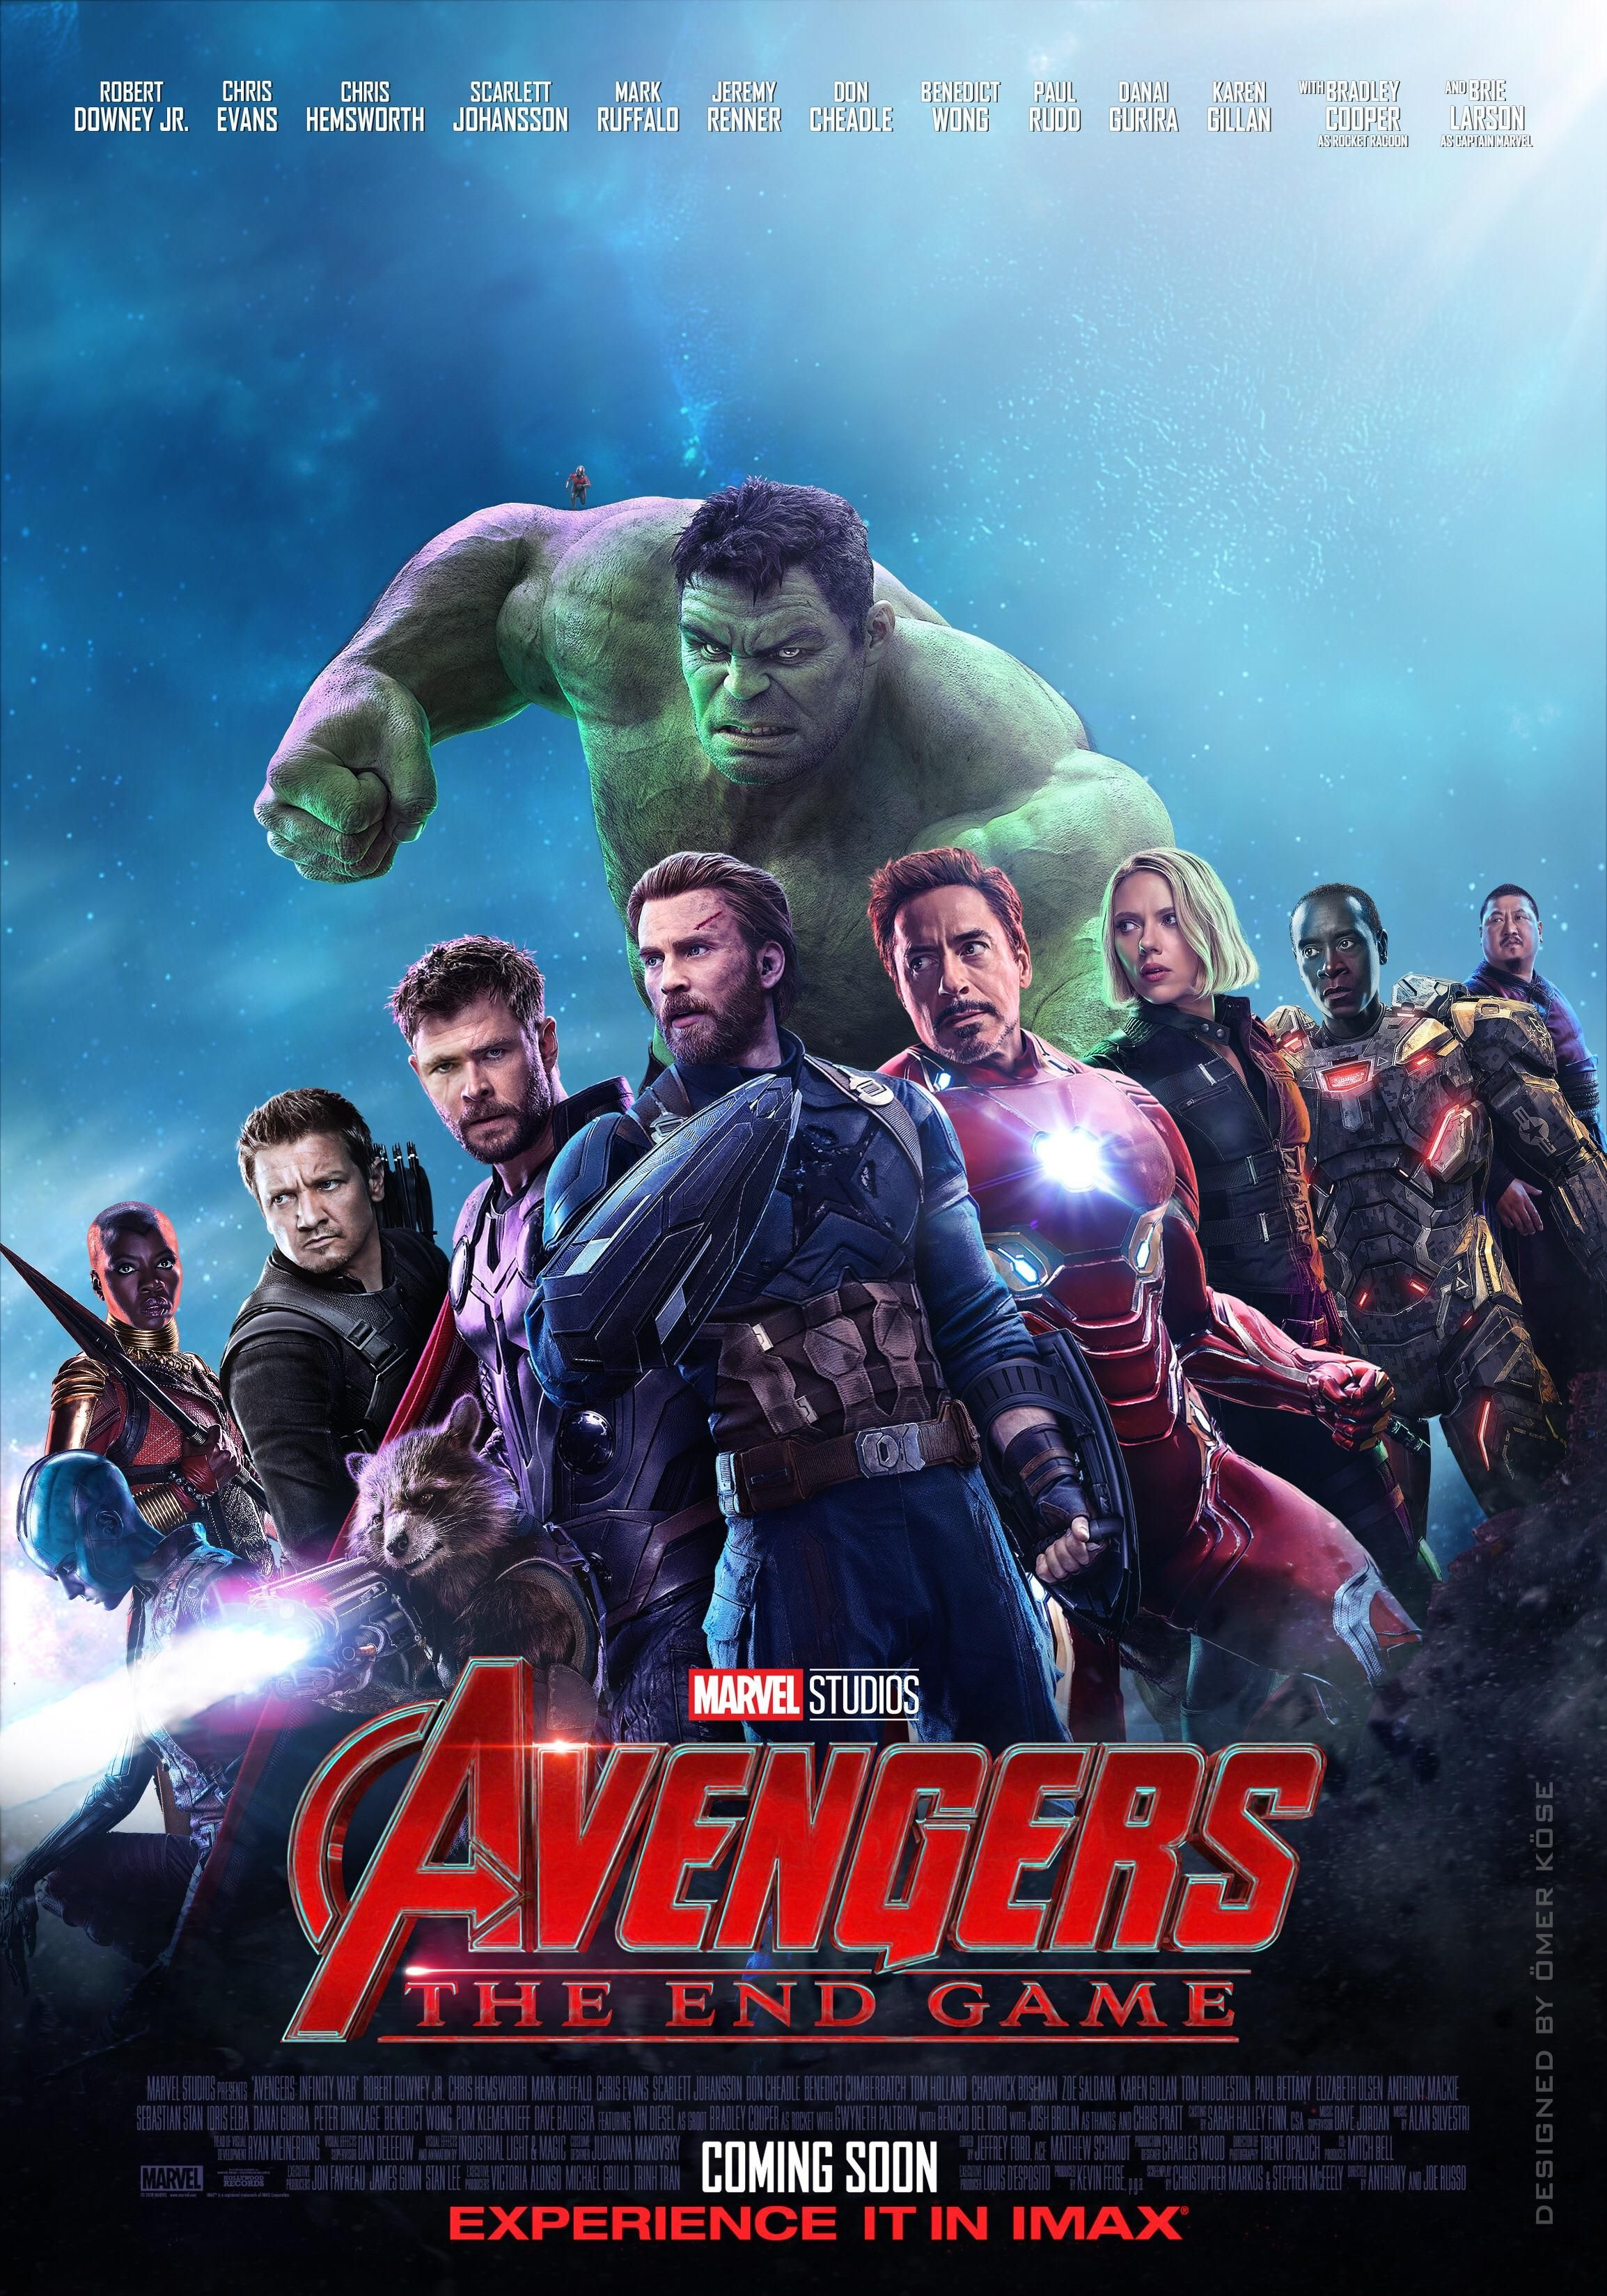 Avengersendgame Avengersendgametrailer Avengers4 Avengers Endgame Avengers Endgame Avengersendgametheory Ave Avengers Poster Avengers Avengers Pictures